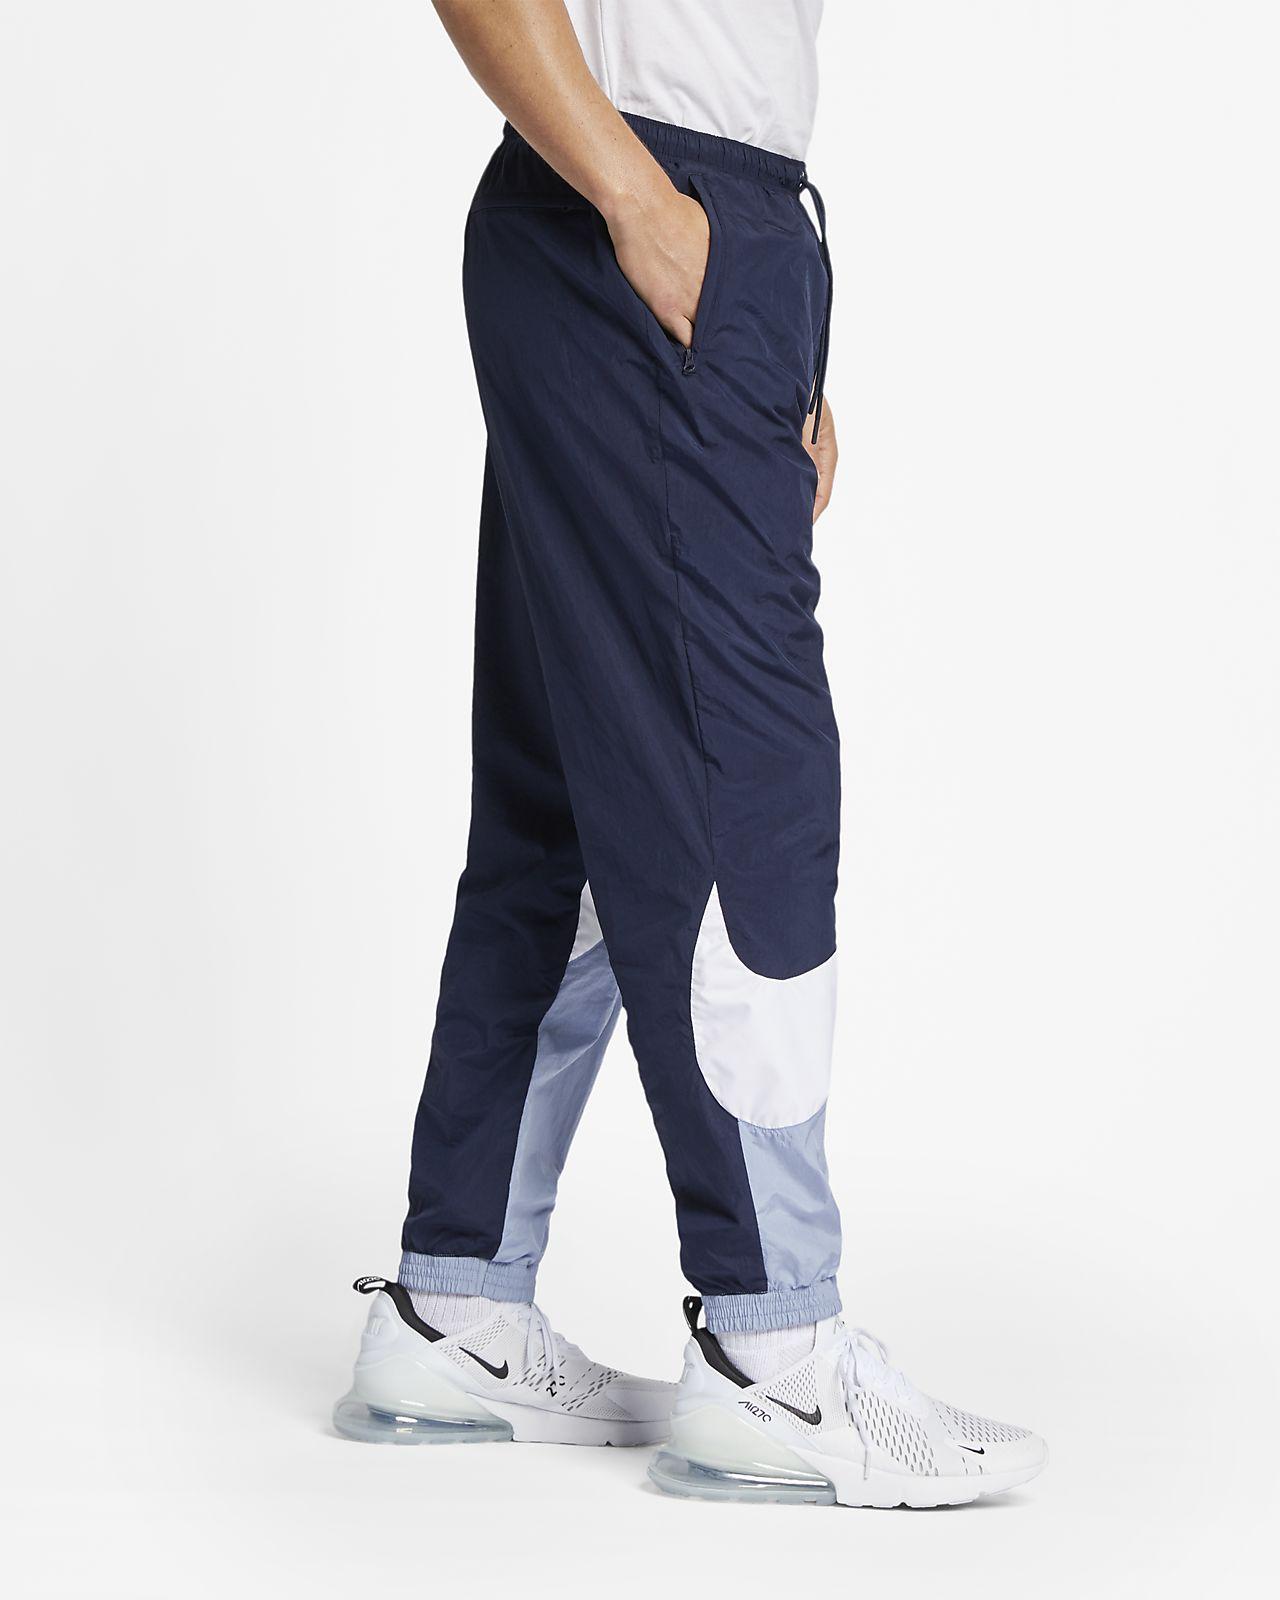 c98540336e2c1 Nike Sportswear Woven Trousers. Nike.com GB